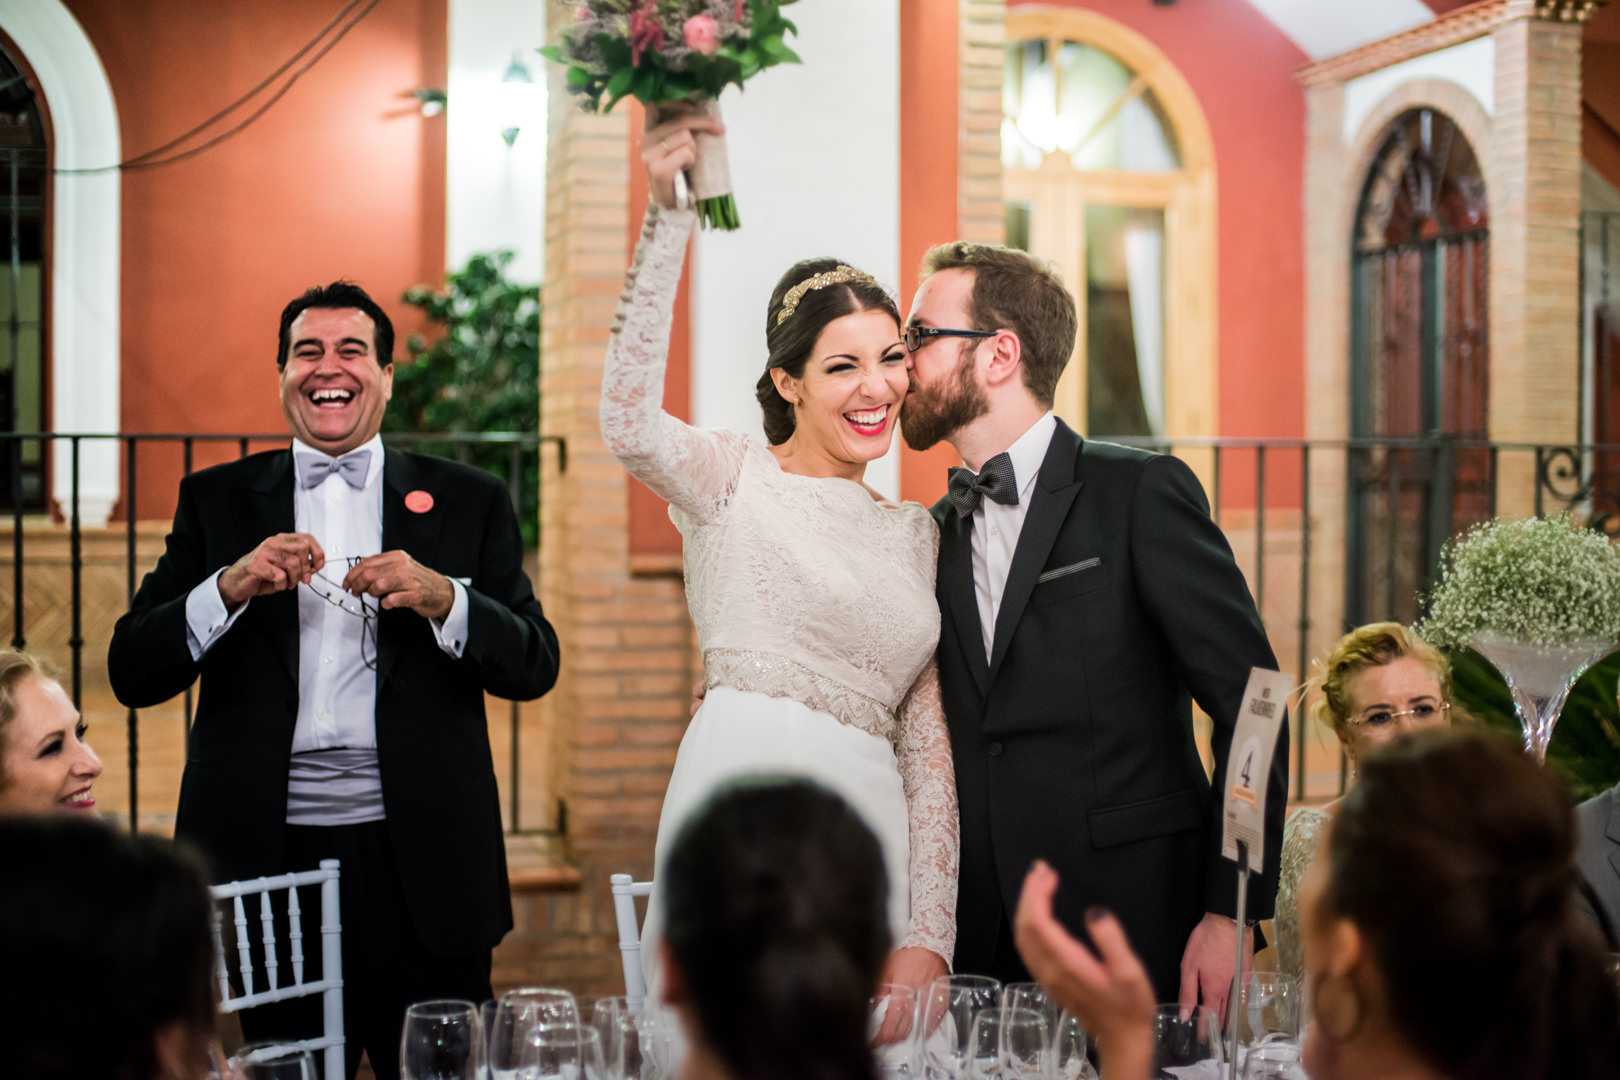 Boda-Sevilla-Museo-Carmona-Hamburgo-Maria-Carles-engagement-Rafael-Torres-fotografo-bodas-sevilla-madrid-barcelona-wedding-photographer--36.jpg